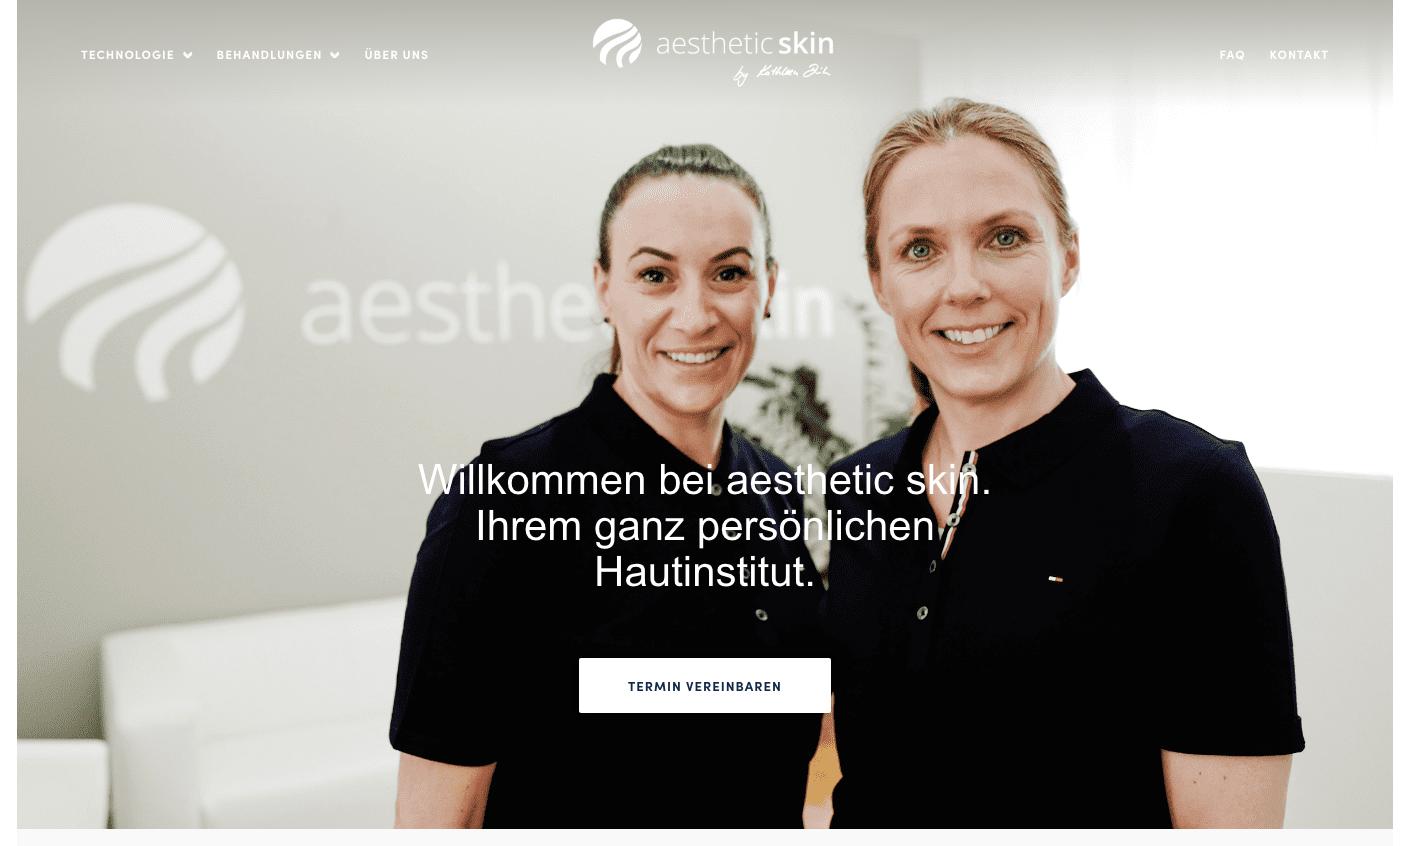 aesthetic skin Muenchen